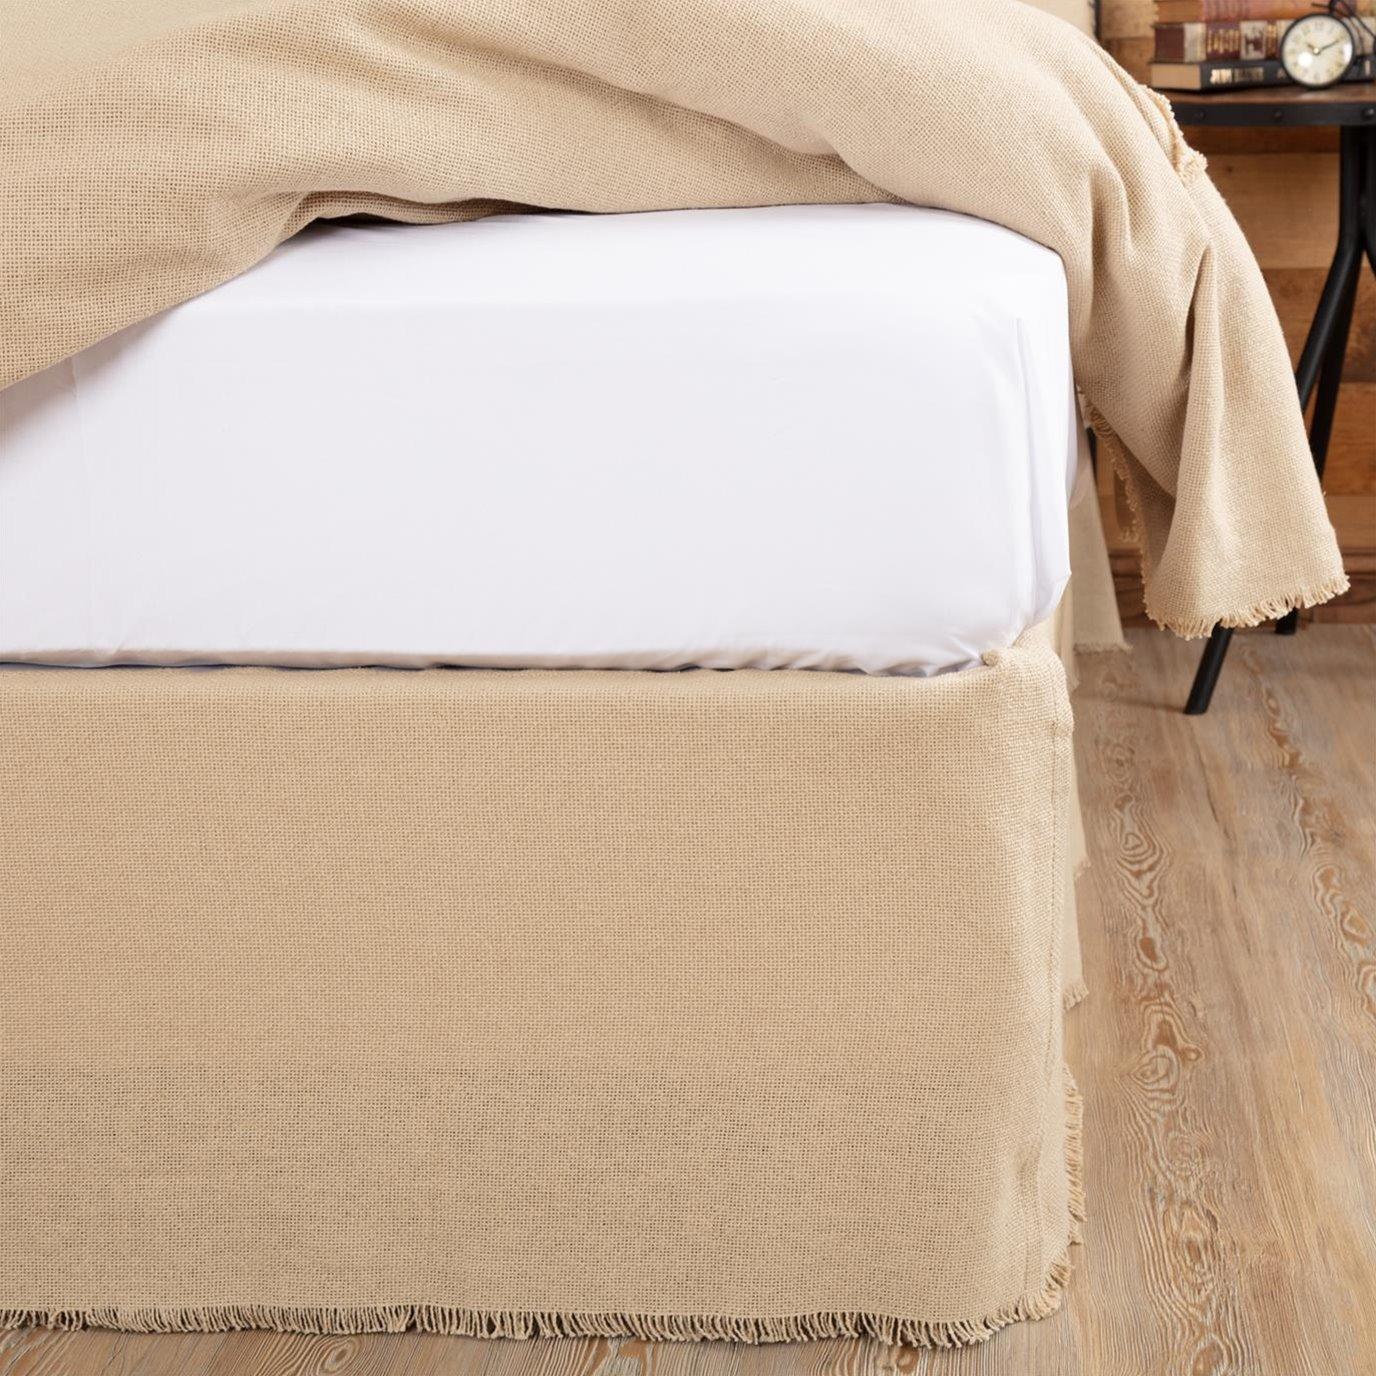 Burlap Vintage Fringed Queen Bed Skirt 60x80x16